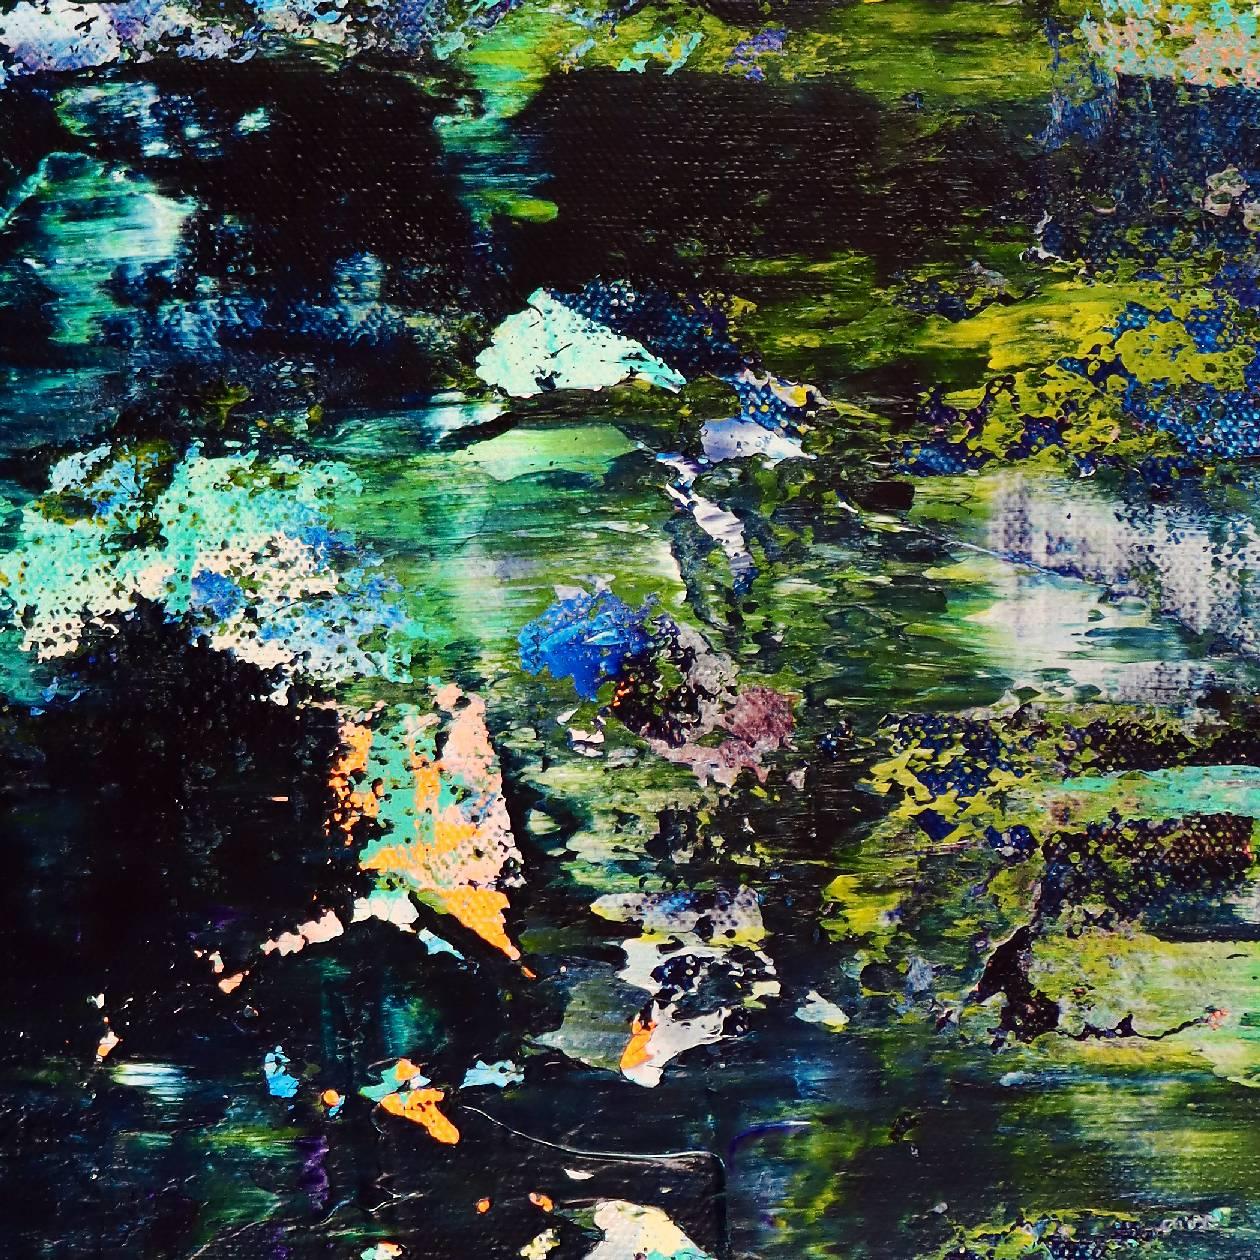 Detail - Deep Forest Secrets (2020) by Nestor Toro